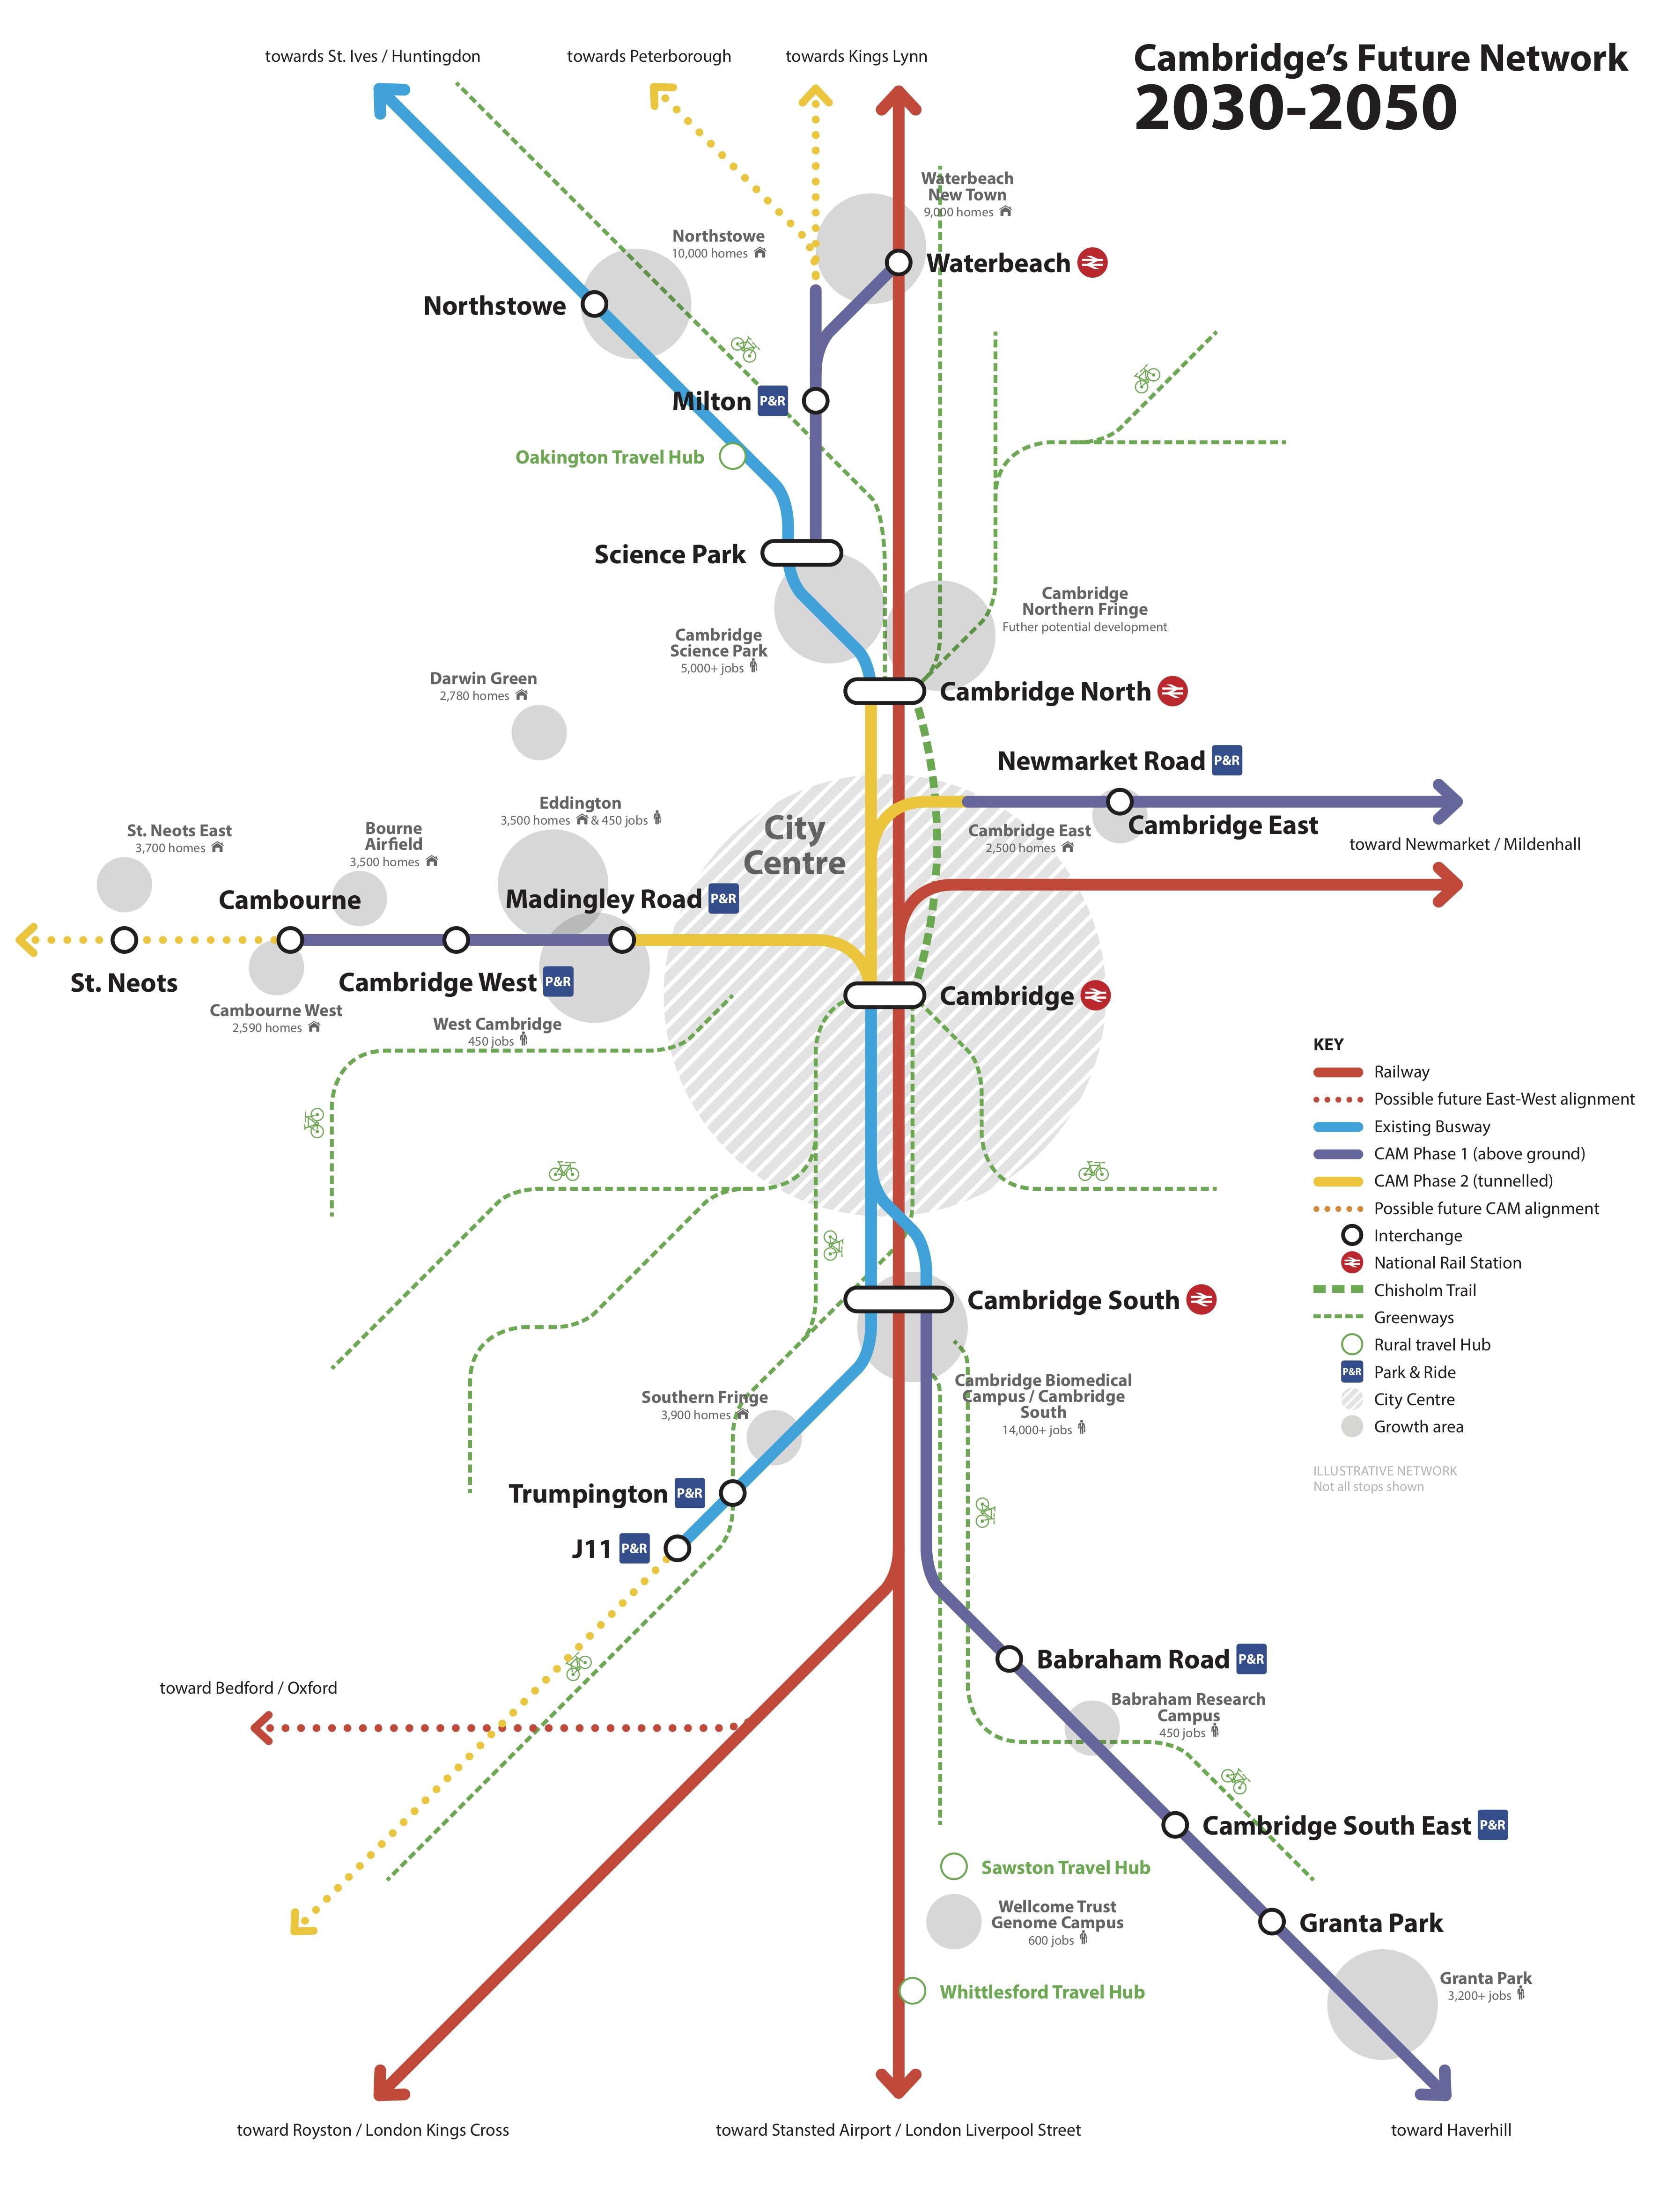 Greater Cambridge Future Network Map 2030-2050